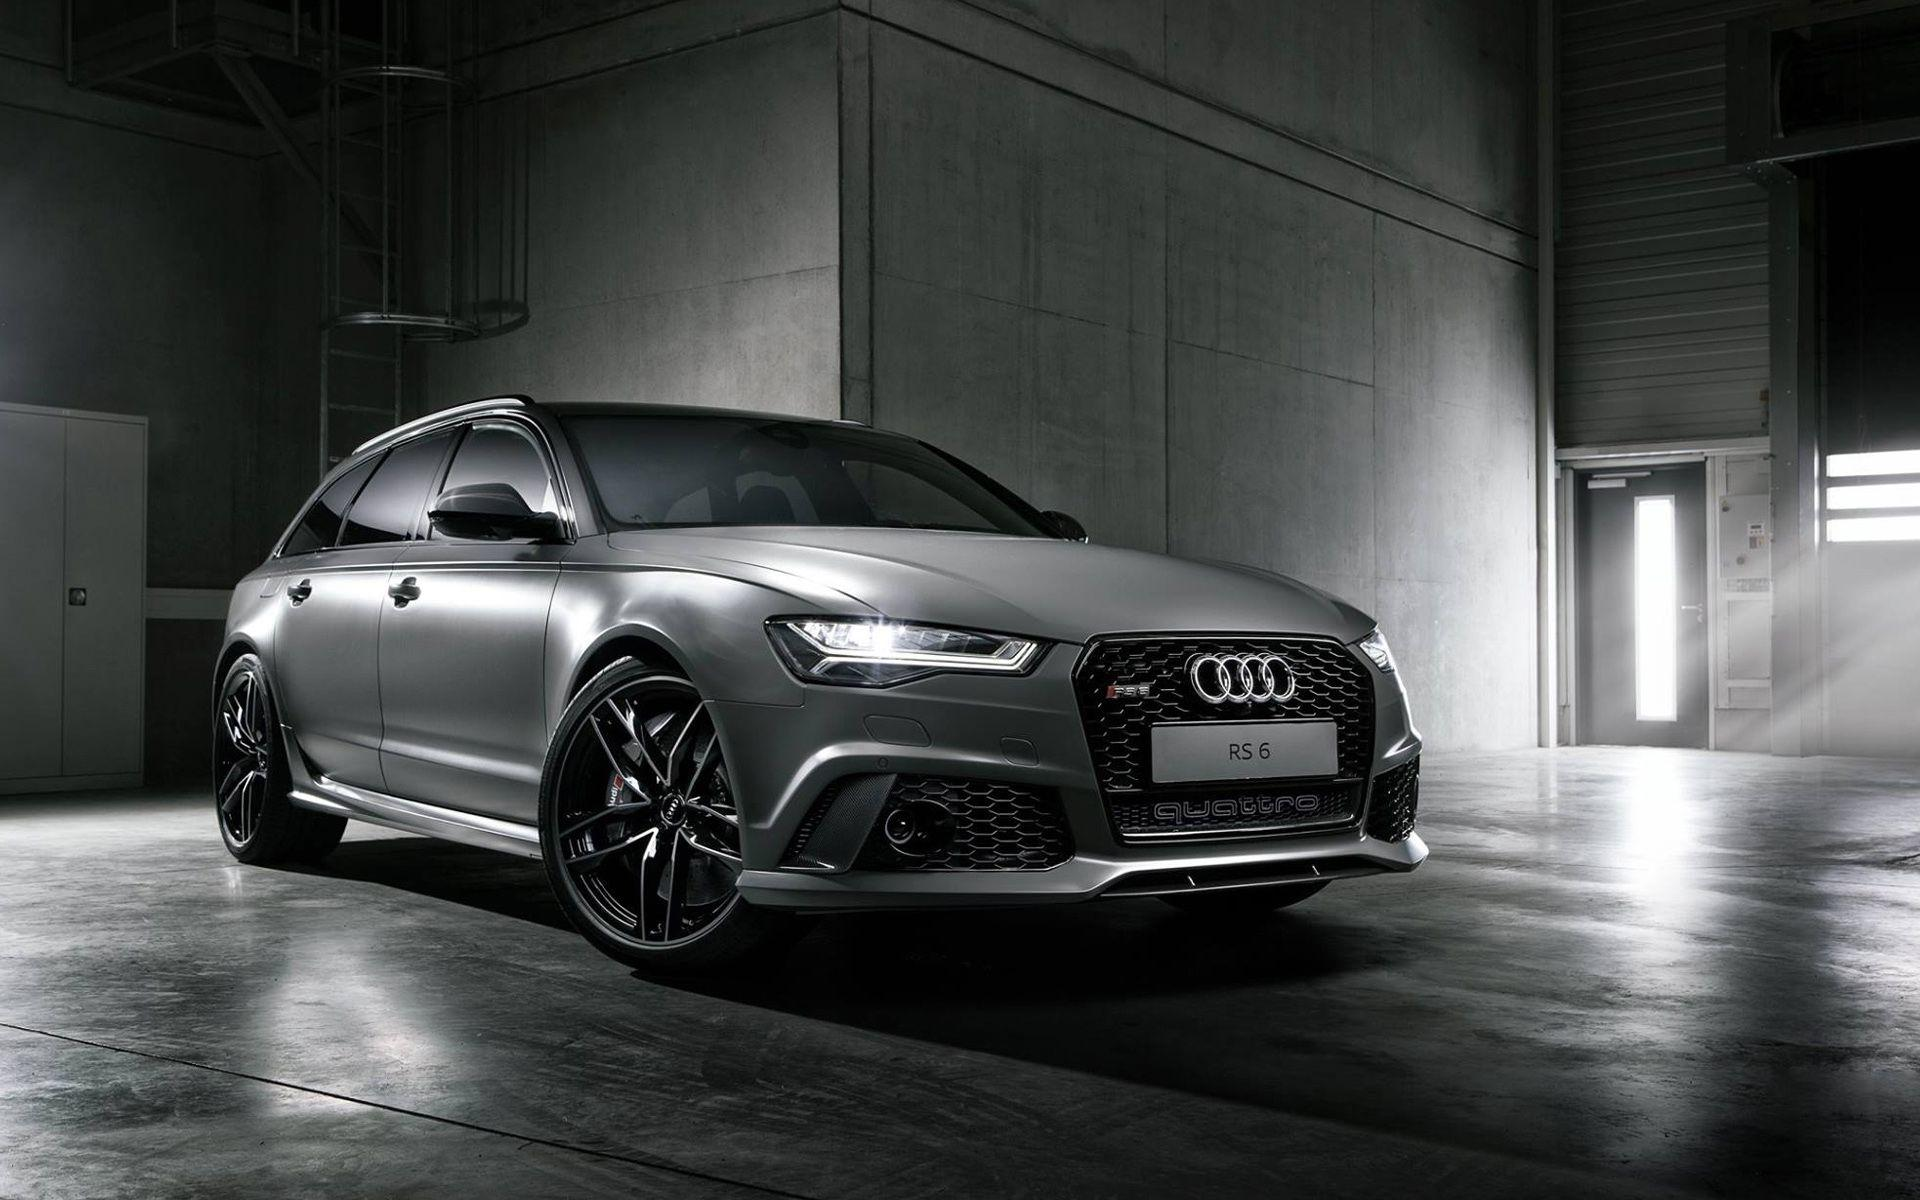 2015 Audi RS6 Avant Exclusive Wallpaper | HD Car Wallpapers